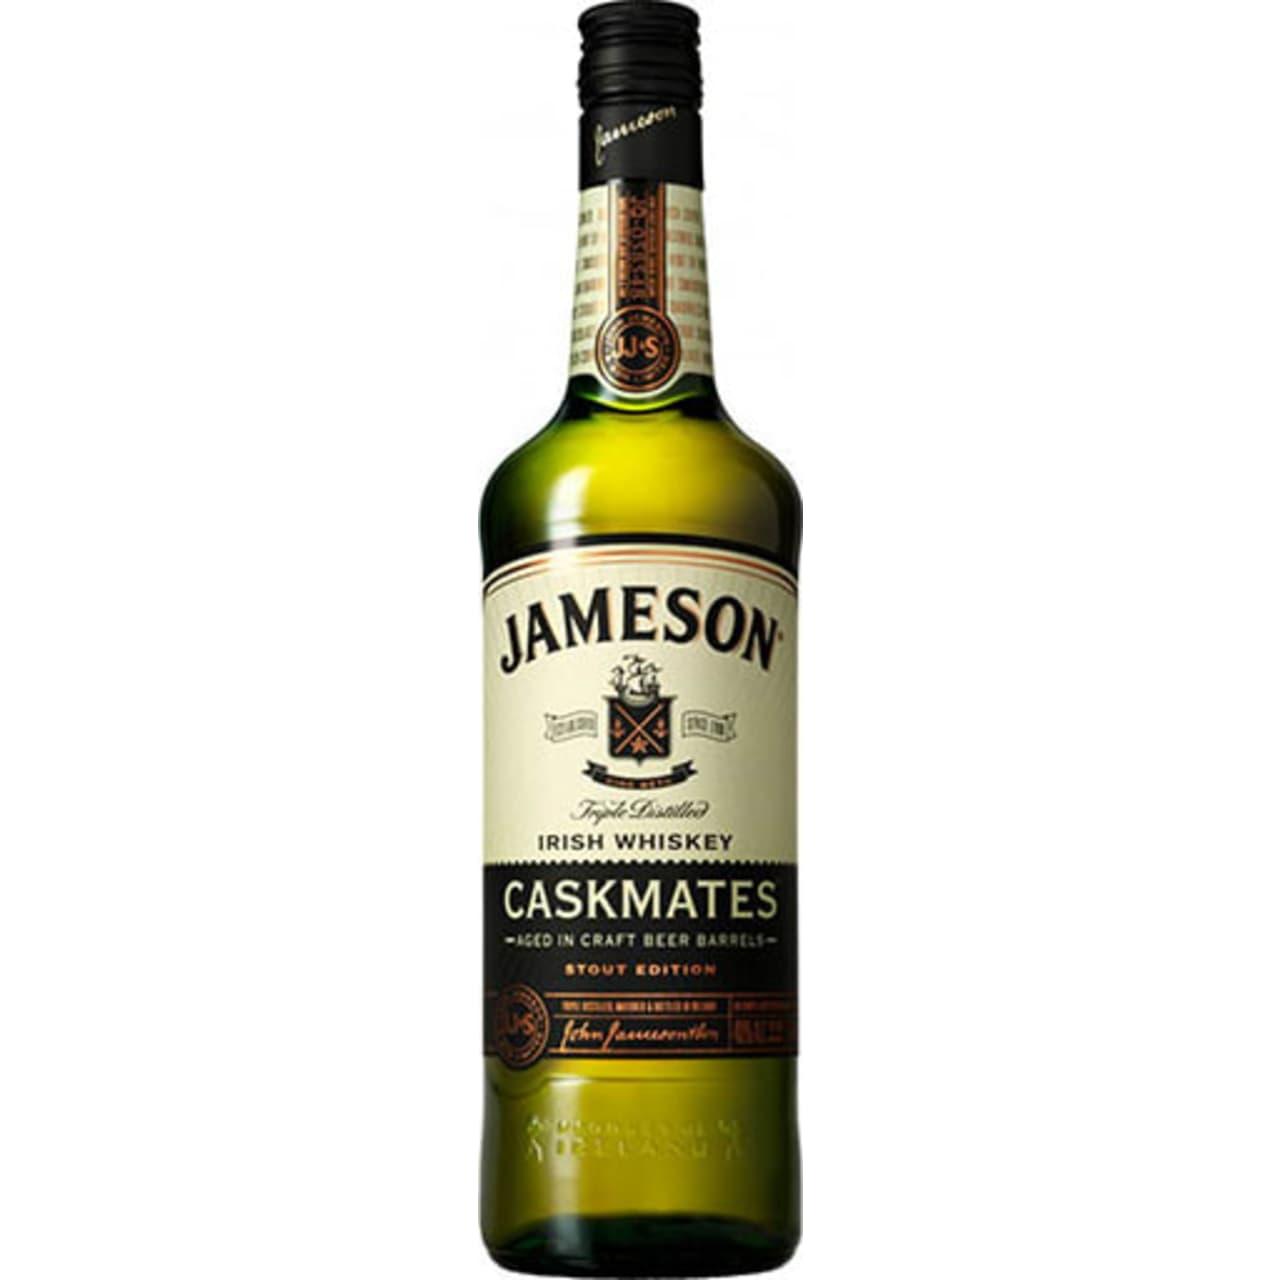 Product Image - Jameson Caskmates Stout Edition Whiskey